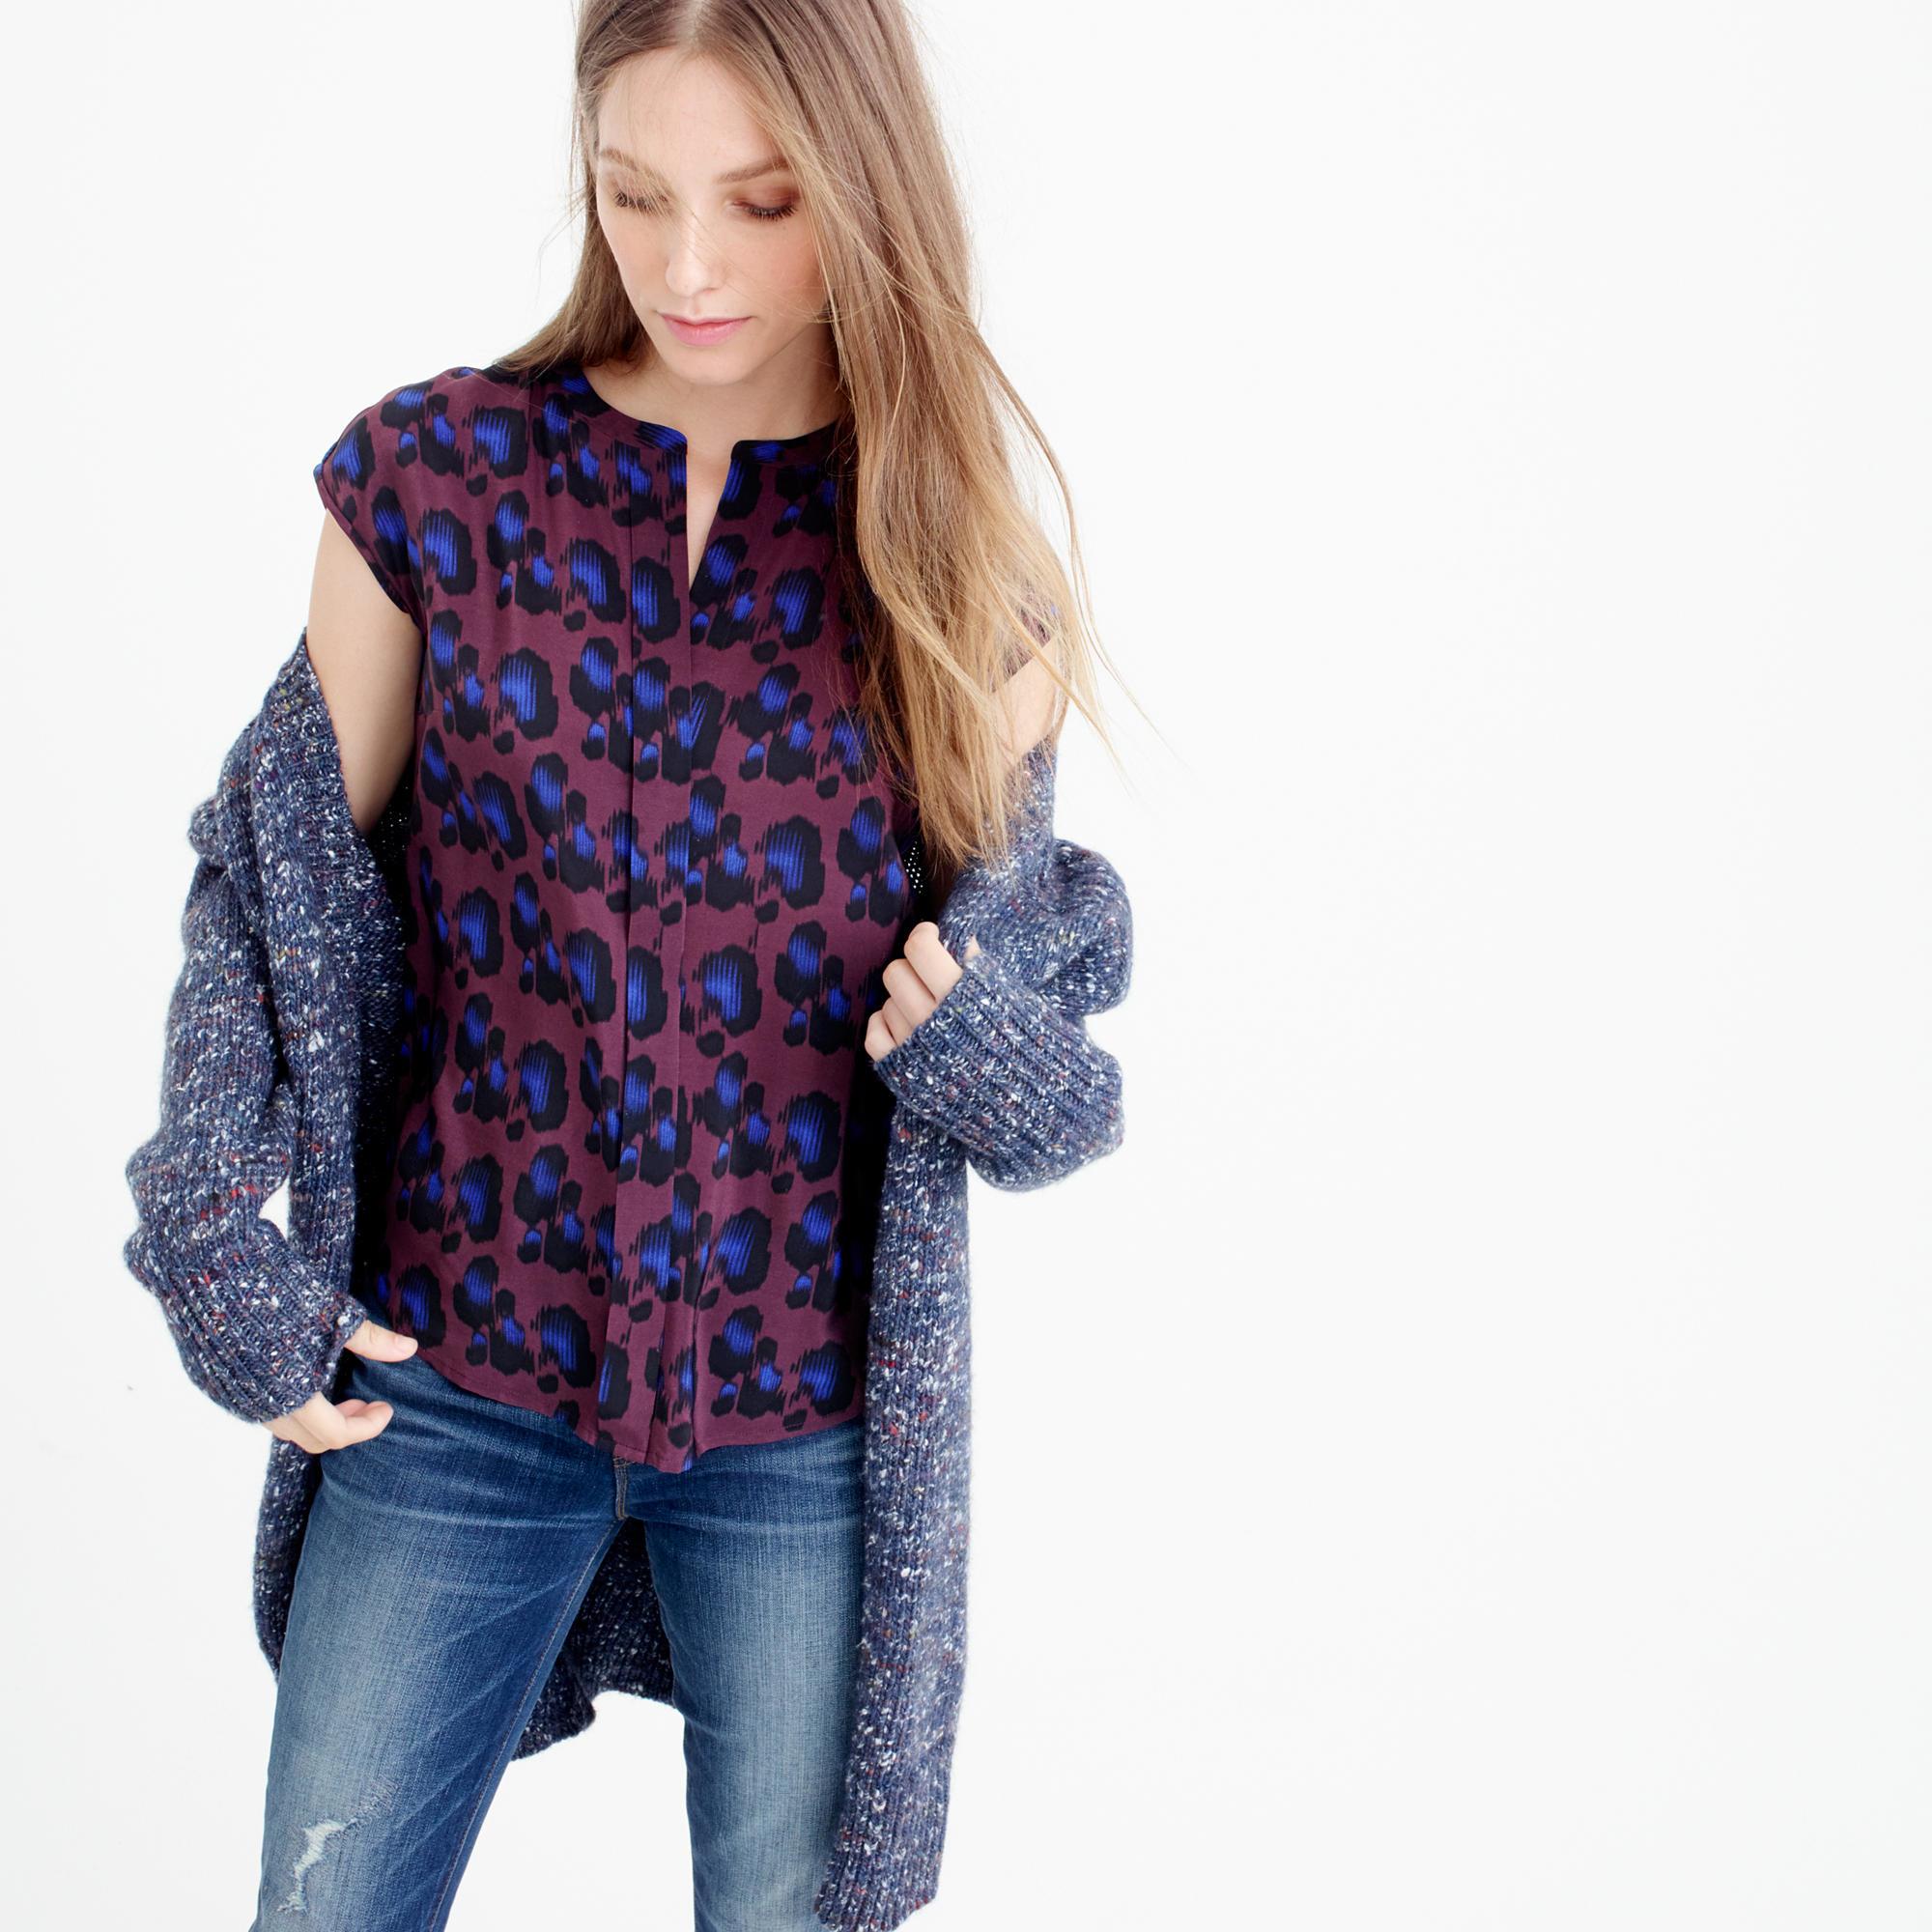 e03380c7fc2719 Gallery. Women s Floral Tops Women s Slim Fit Tees Women s Leopard Print ...